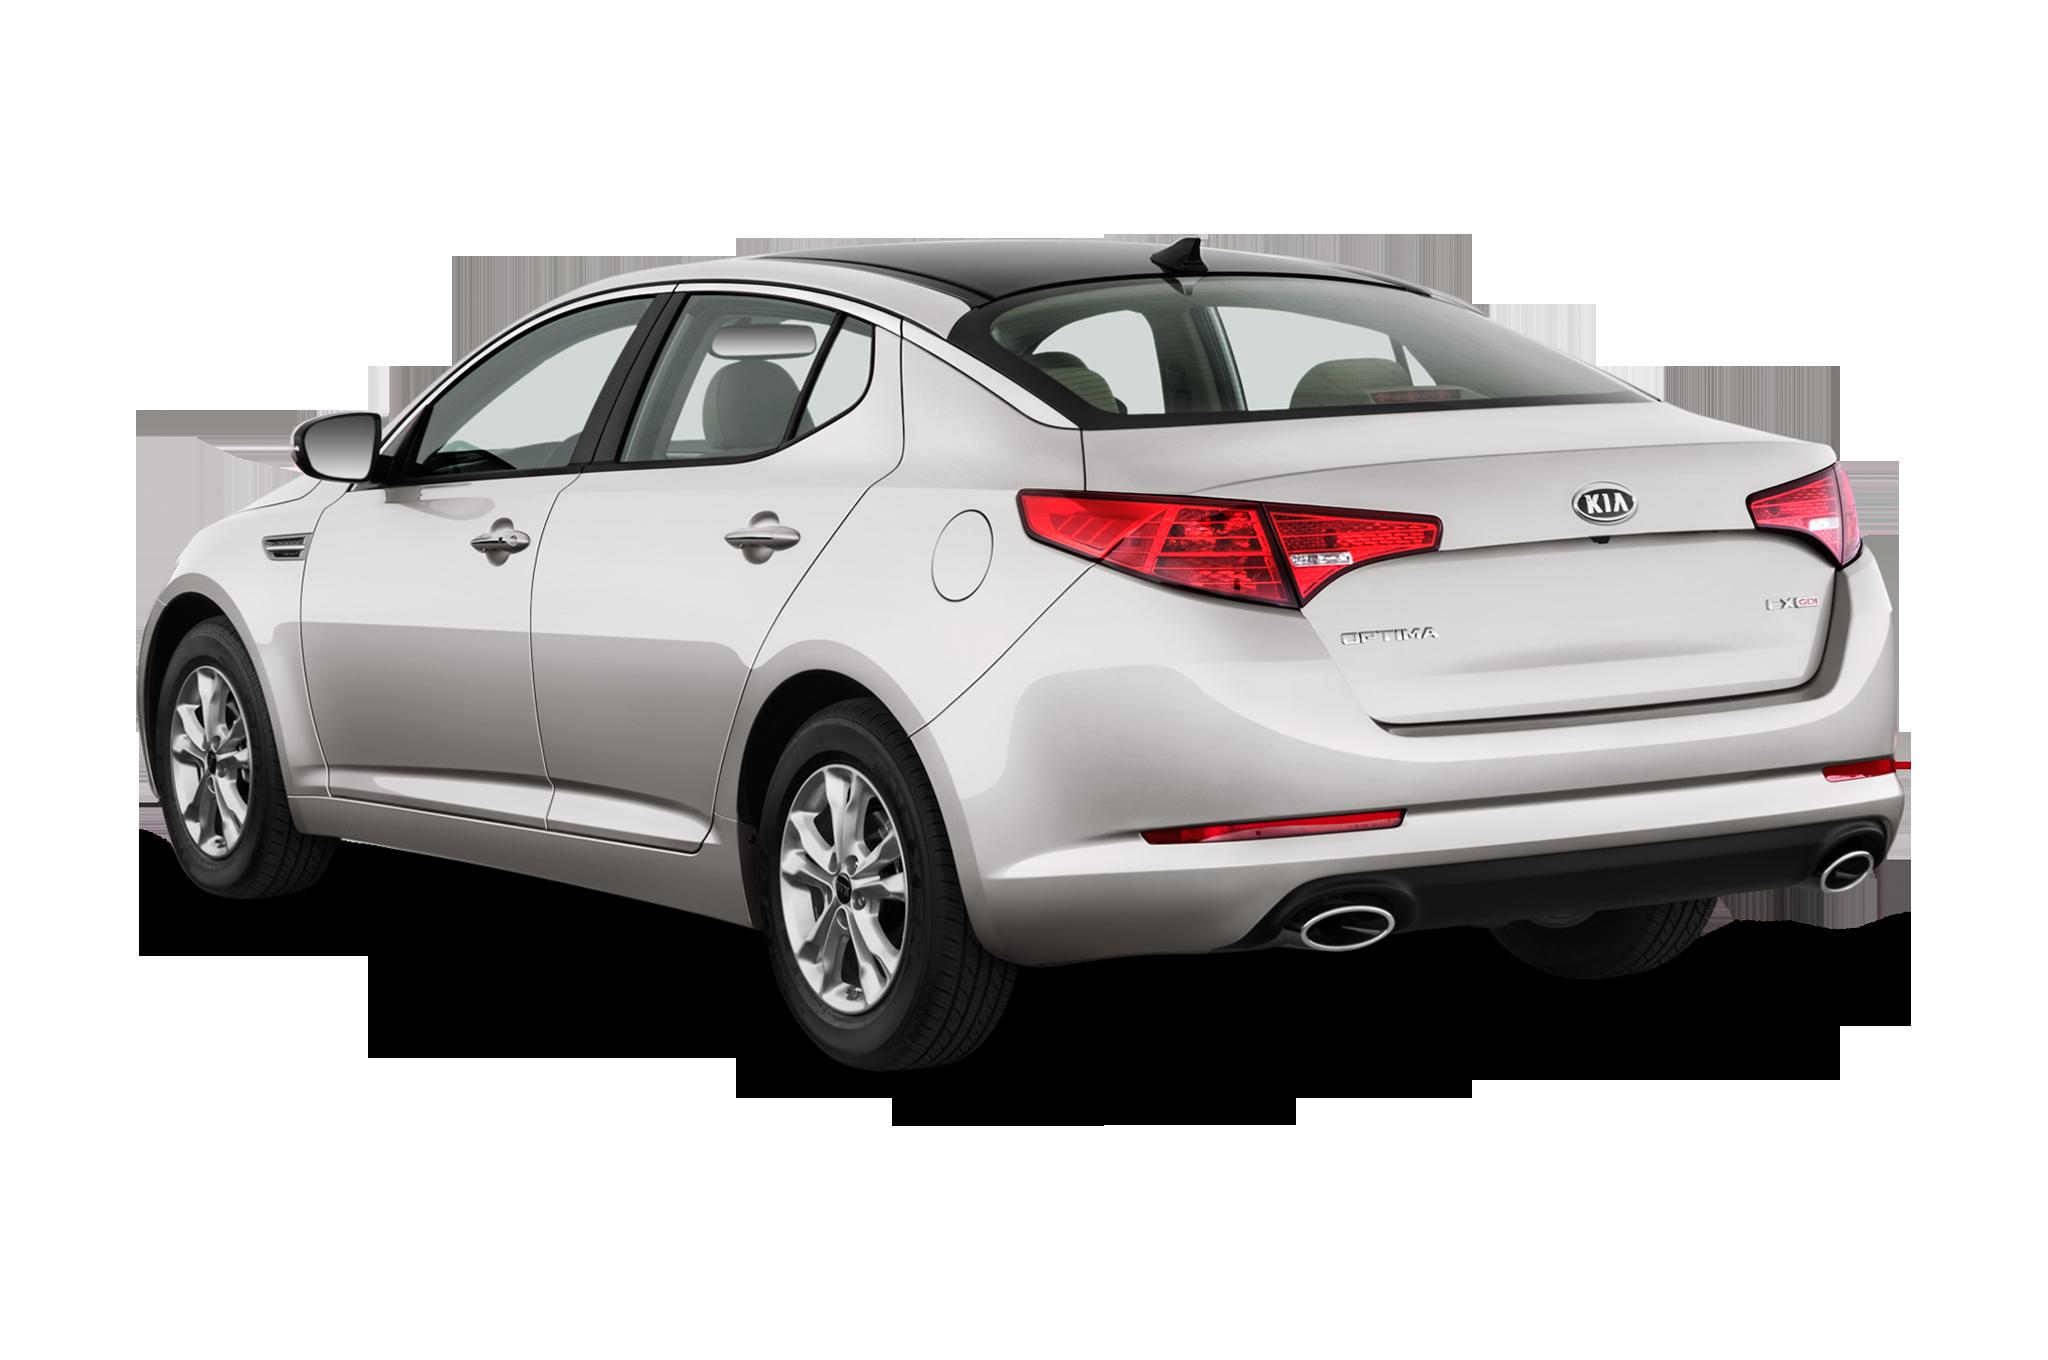 optima kia and news sedan hybrid information